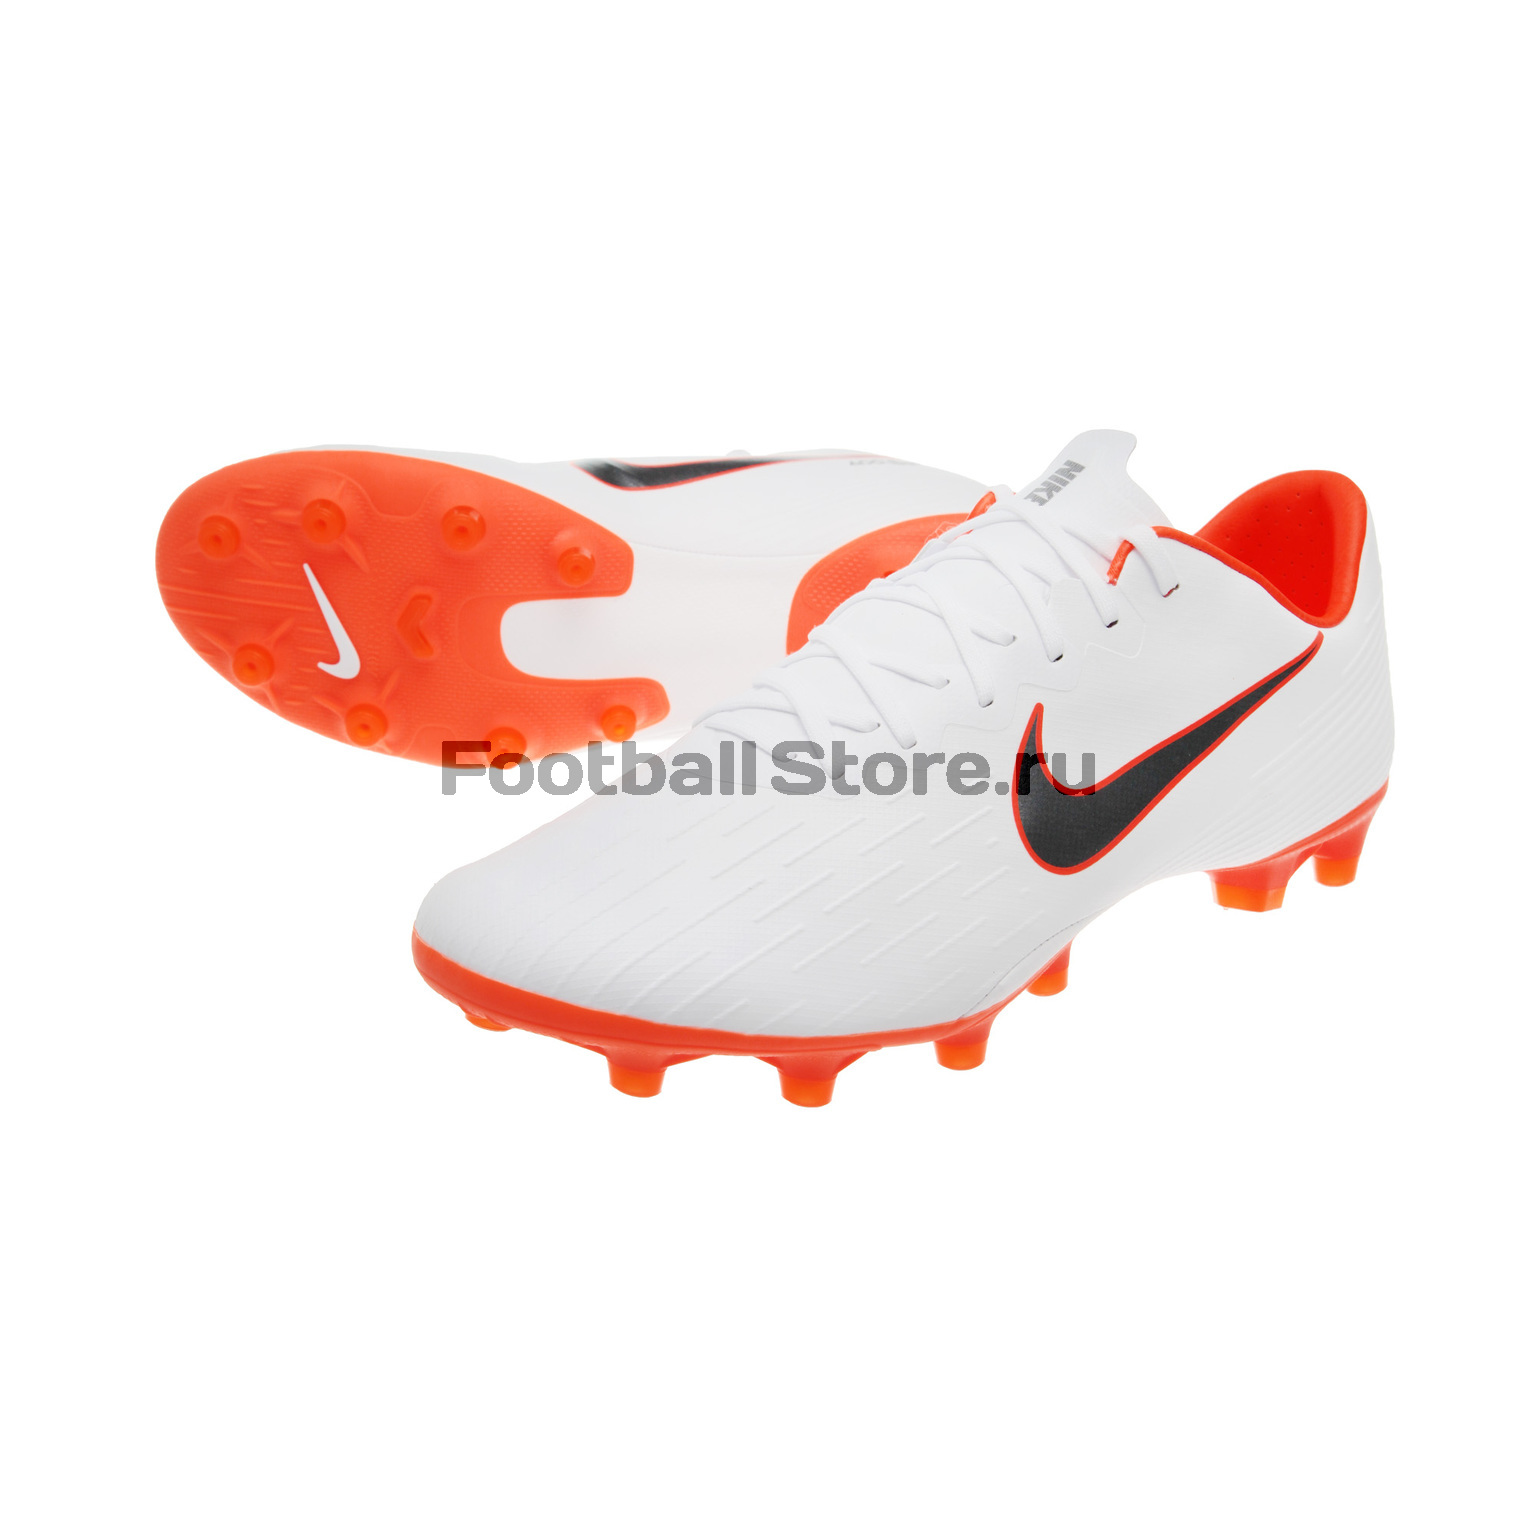 Бутсы Nike Mercurial Vapor 12 Pro AG-Pro AH8759-107 бутсы nike 10 mercurial victory tf 651646 650